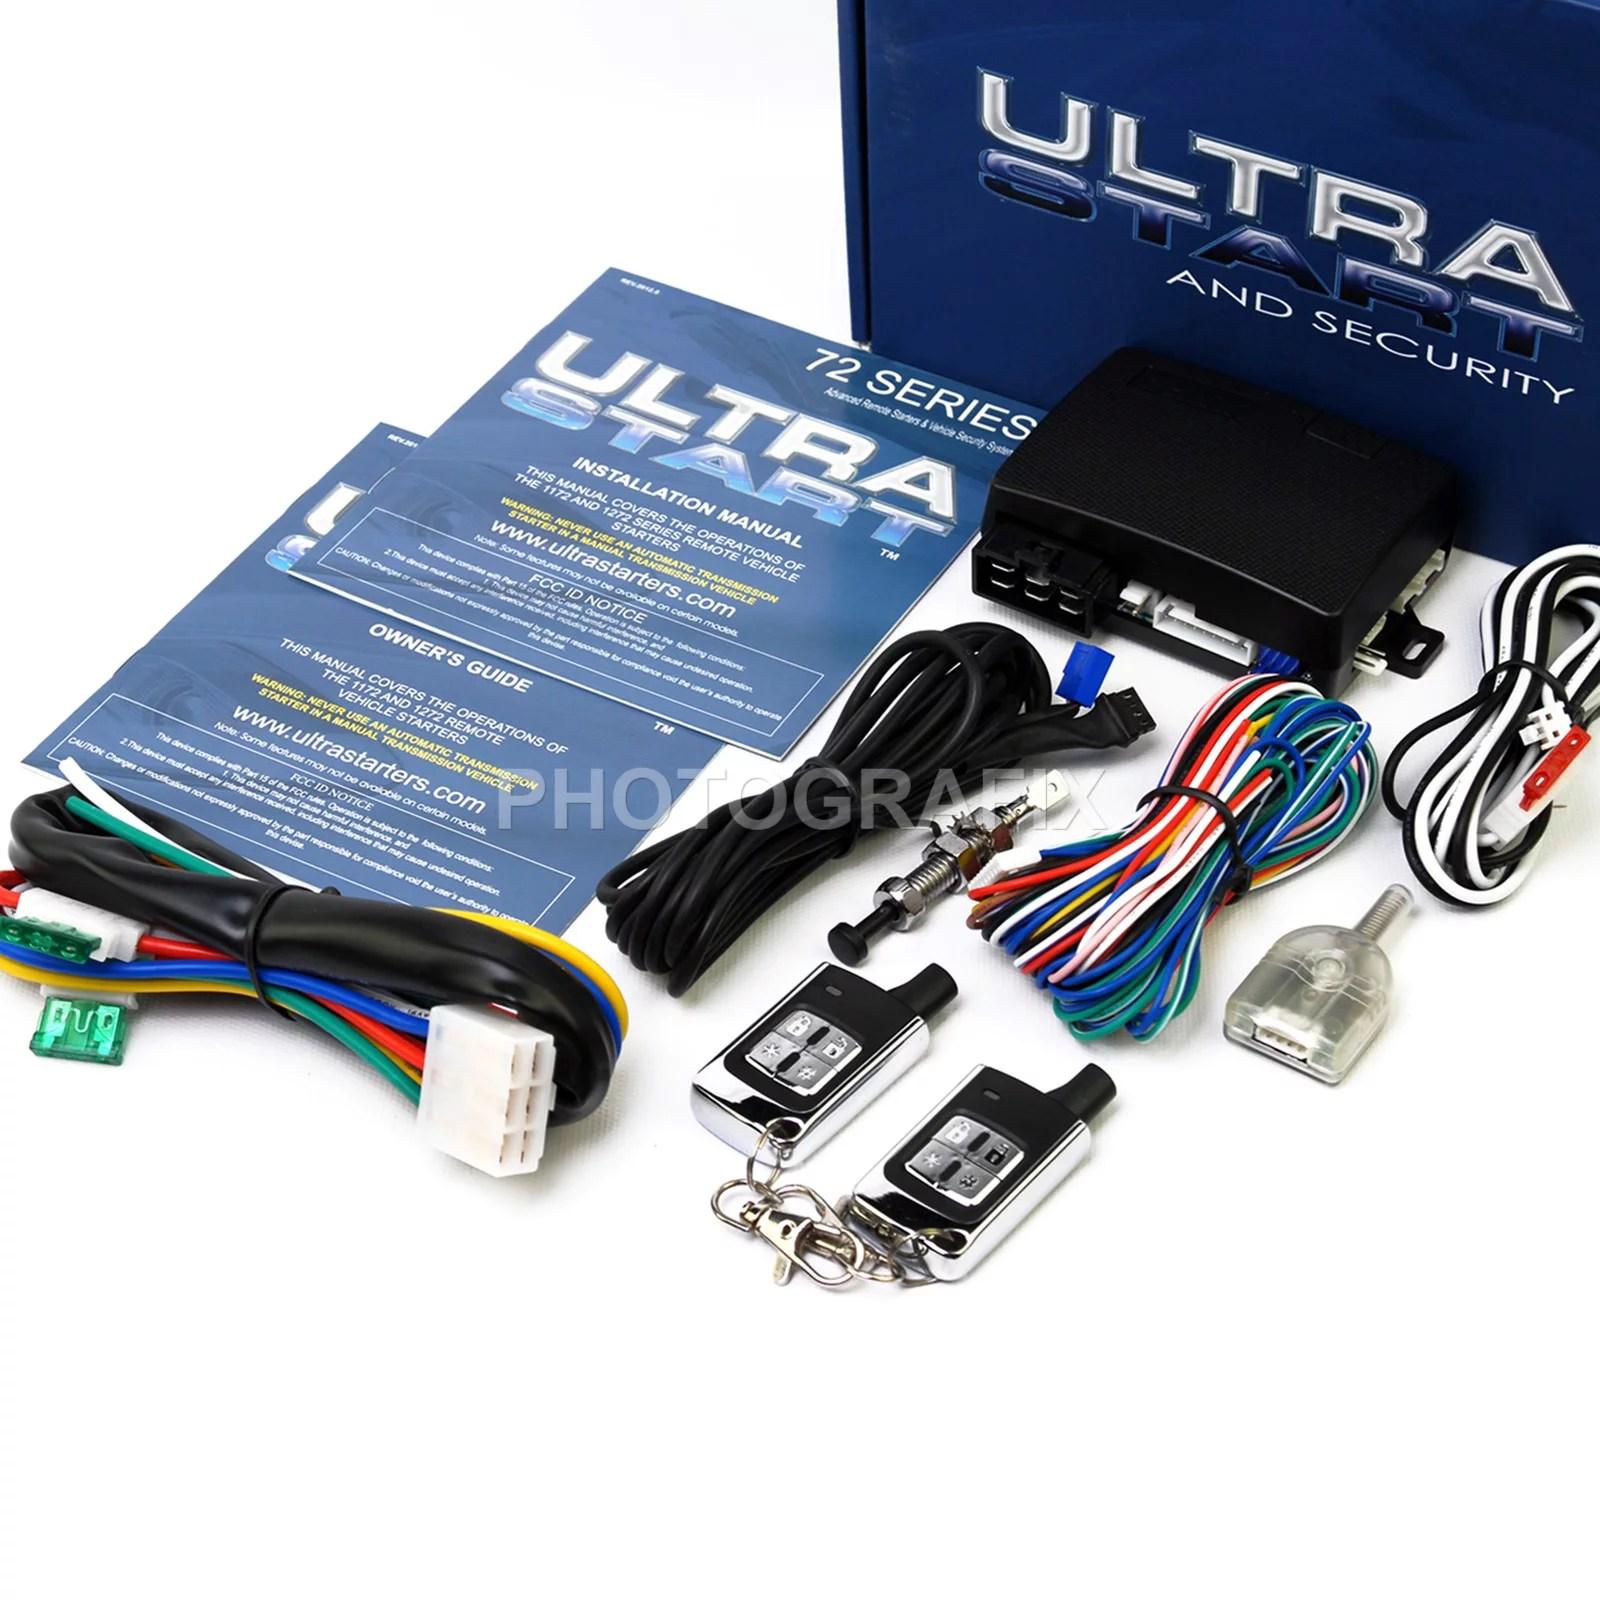 Ultra Remote Start Wiring Diagram Diagrams Avital Shapely Xr Pro Keyless Auto Car Starter Rh Gm